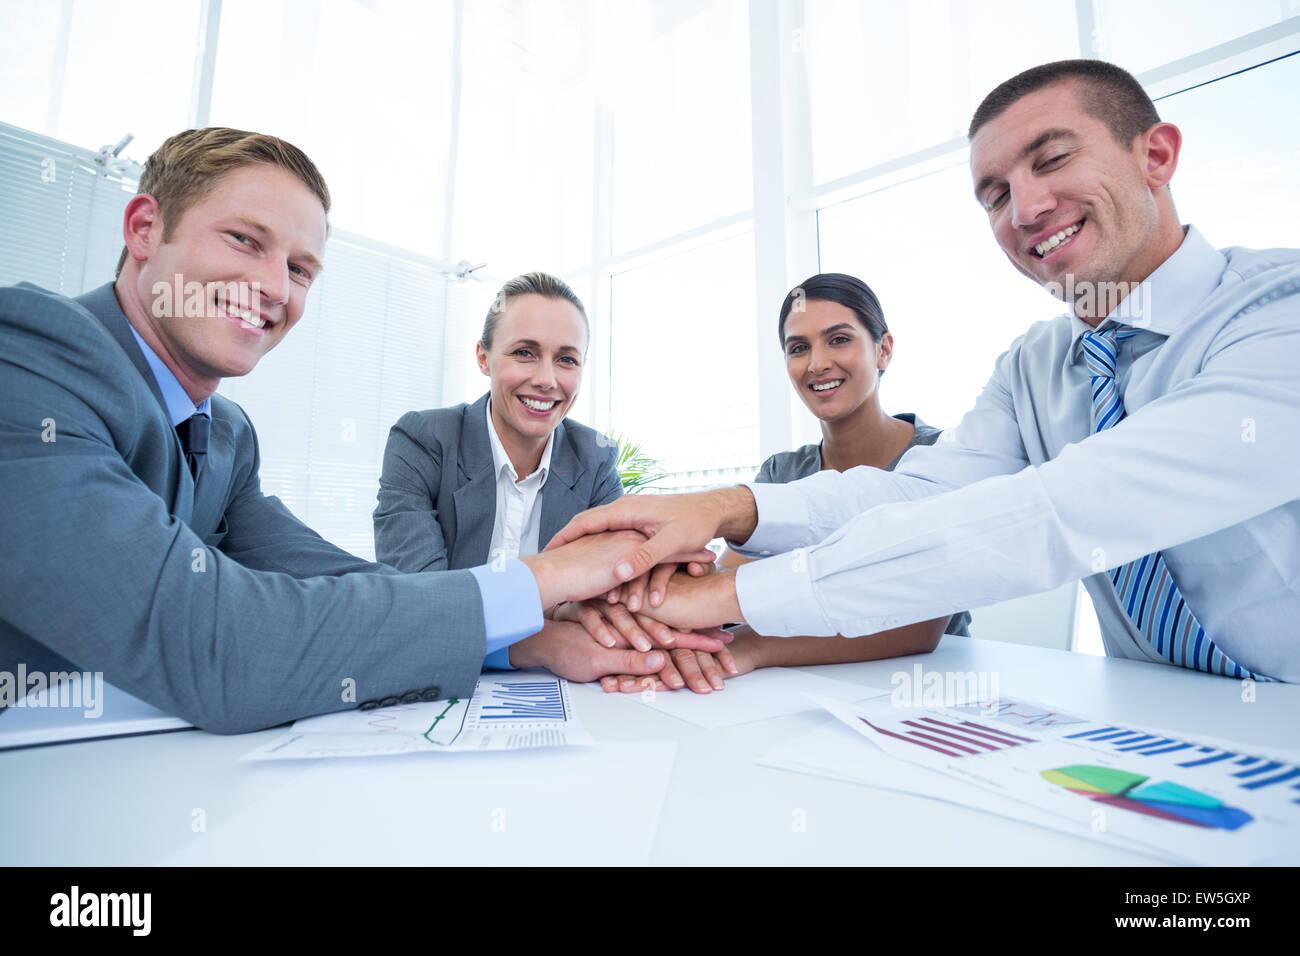 Business team celebrating a good job - Stock Image